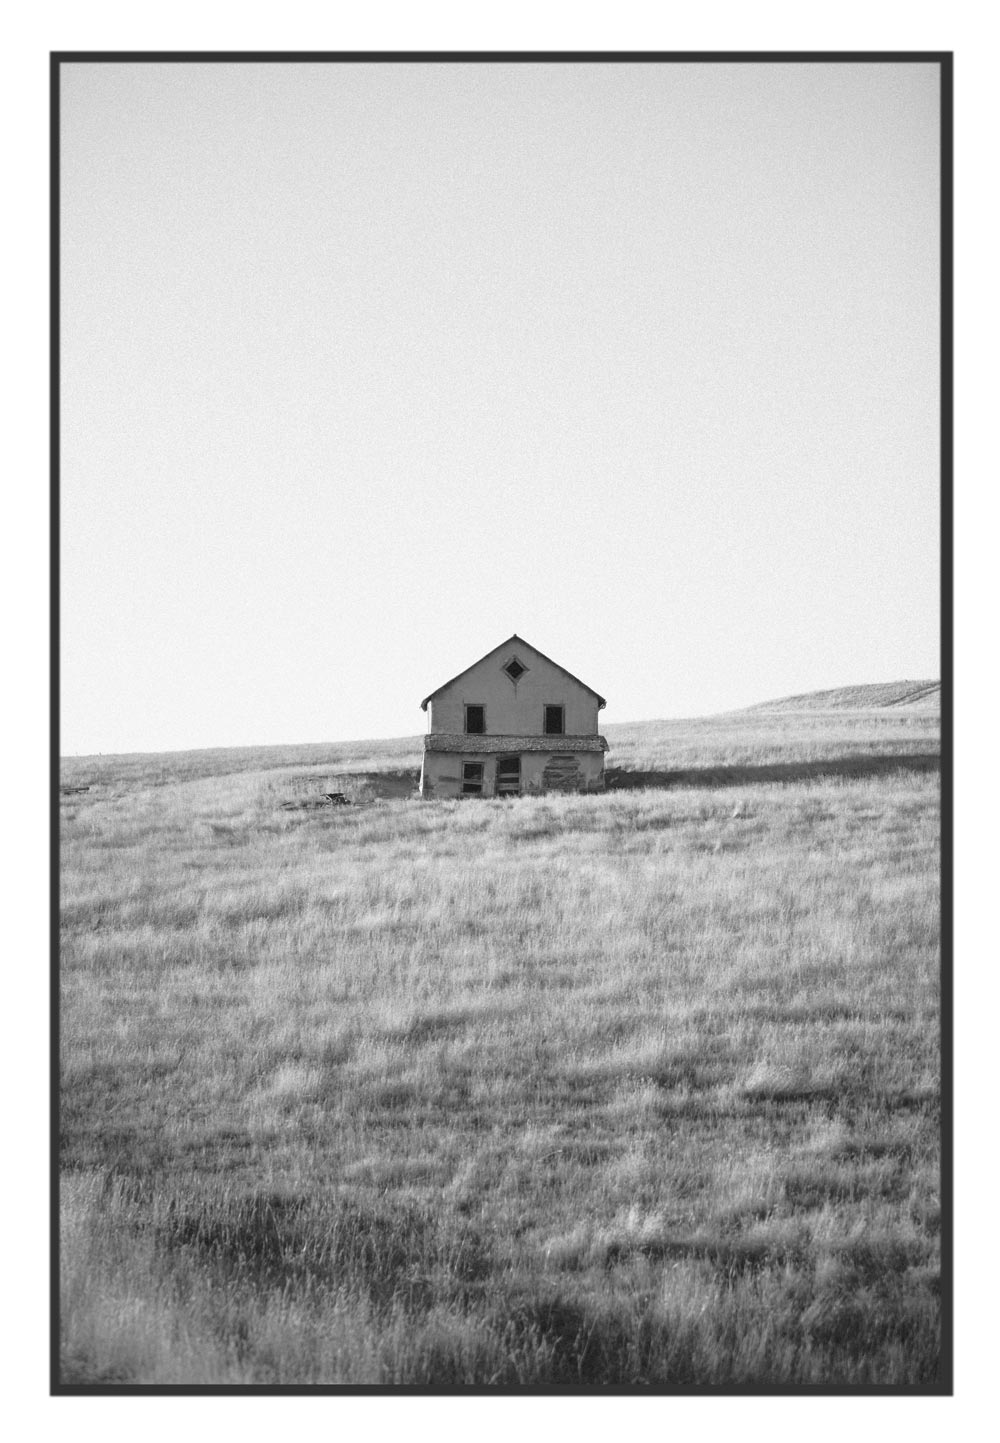 Abandoned Farmstead, Sturgis, South Dakota